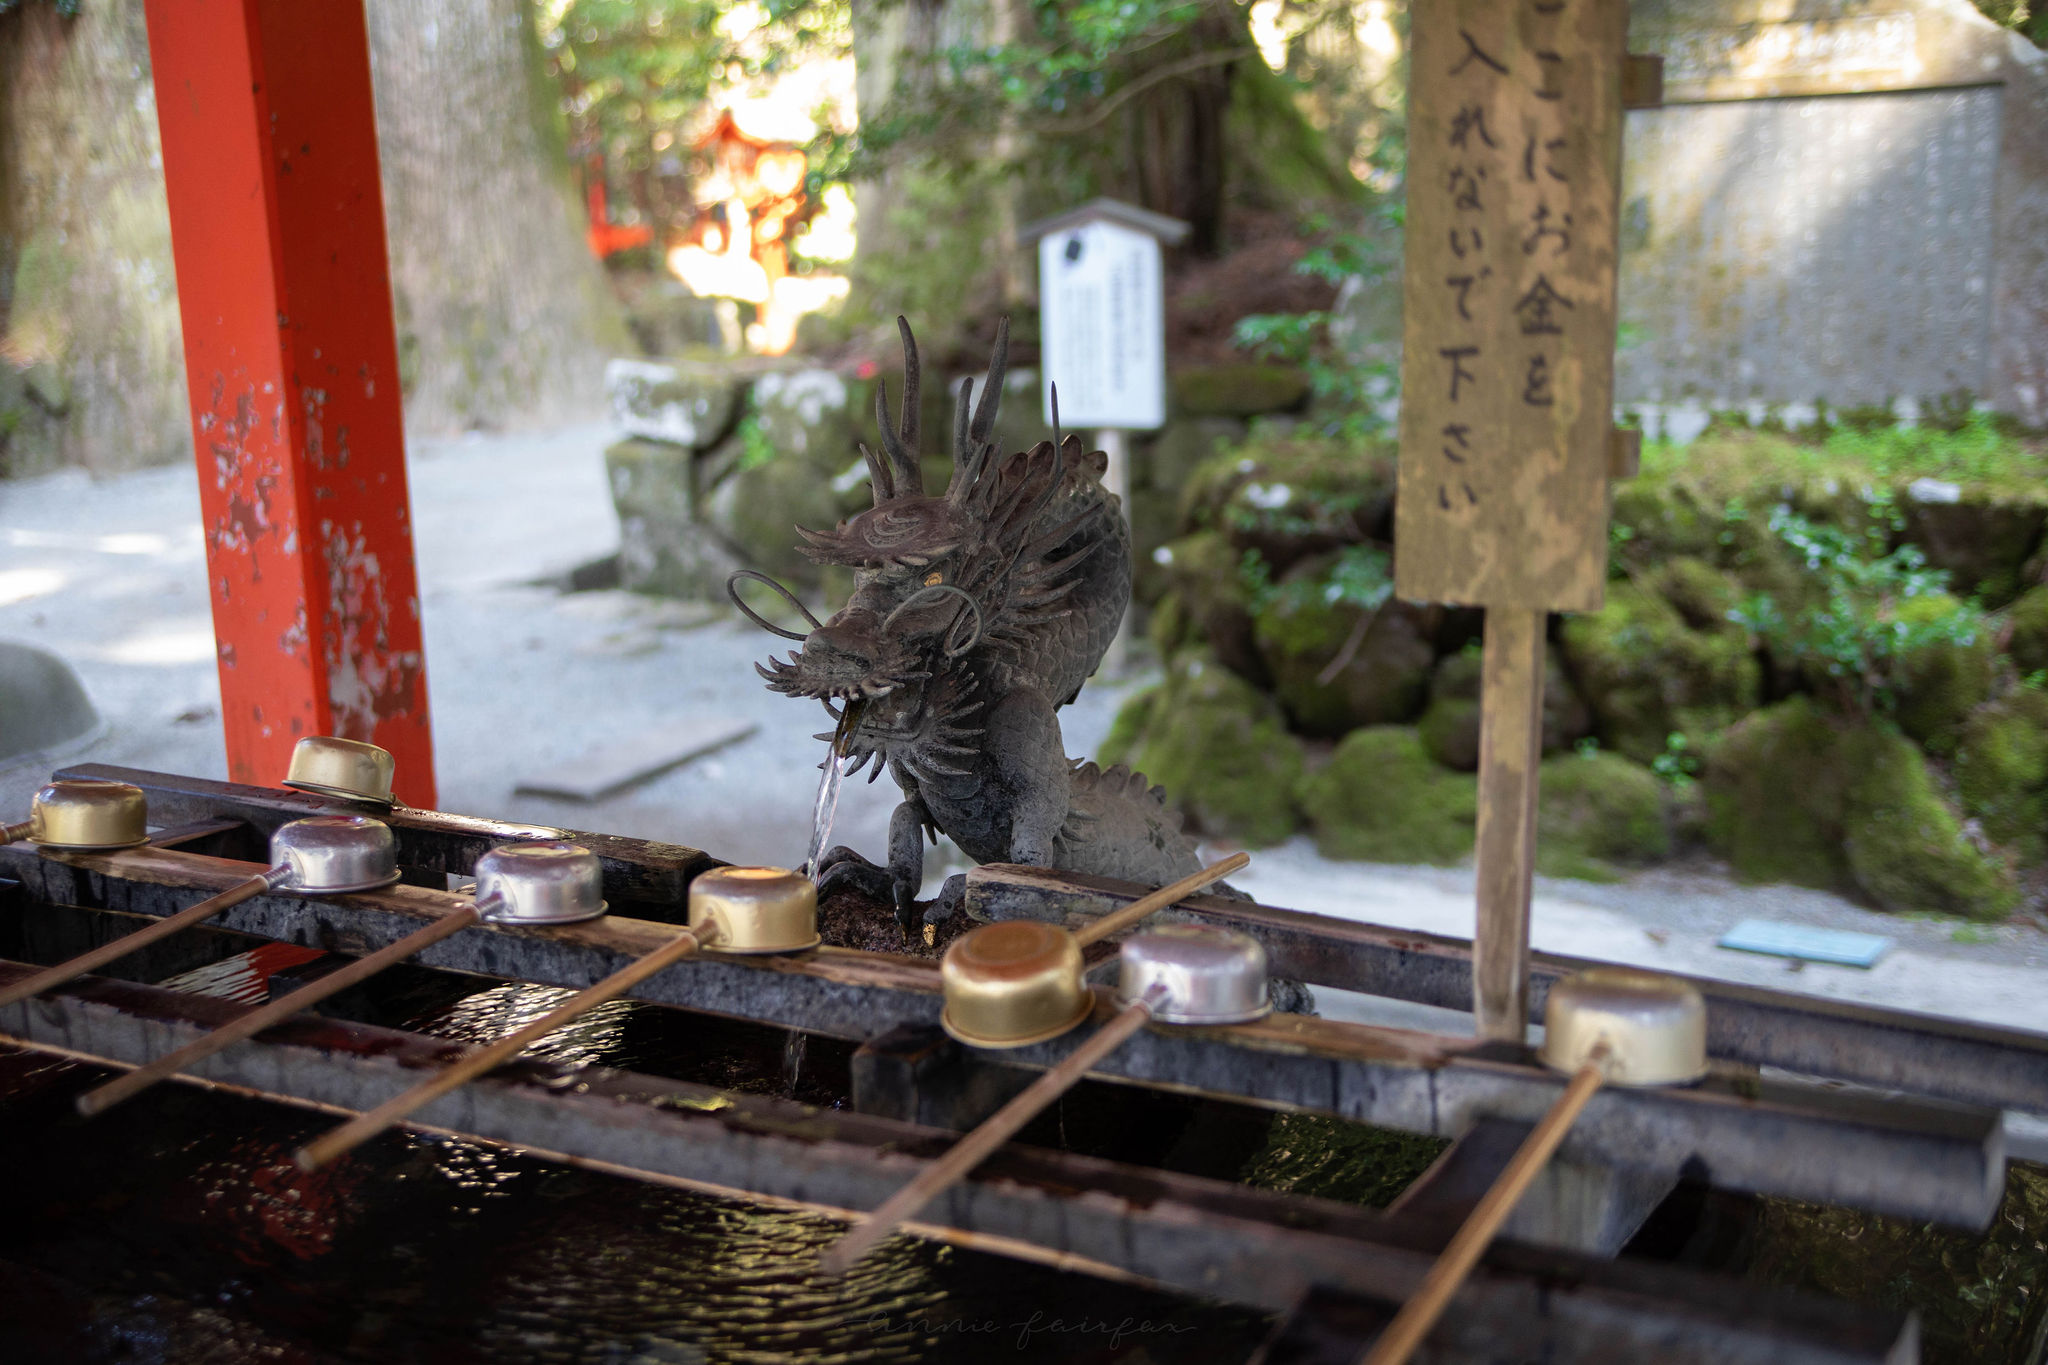 Chozuya Purification Water Ablution at Hakone Shrine in Japan